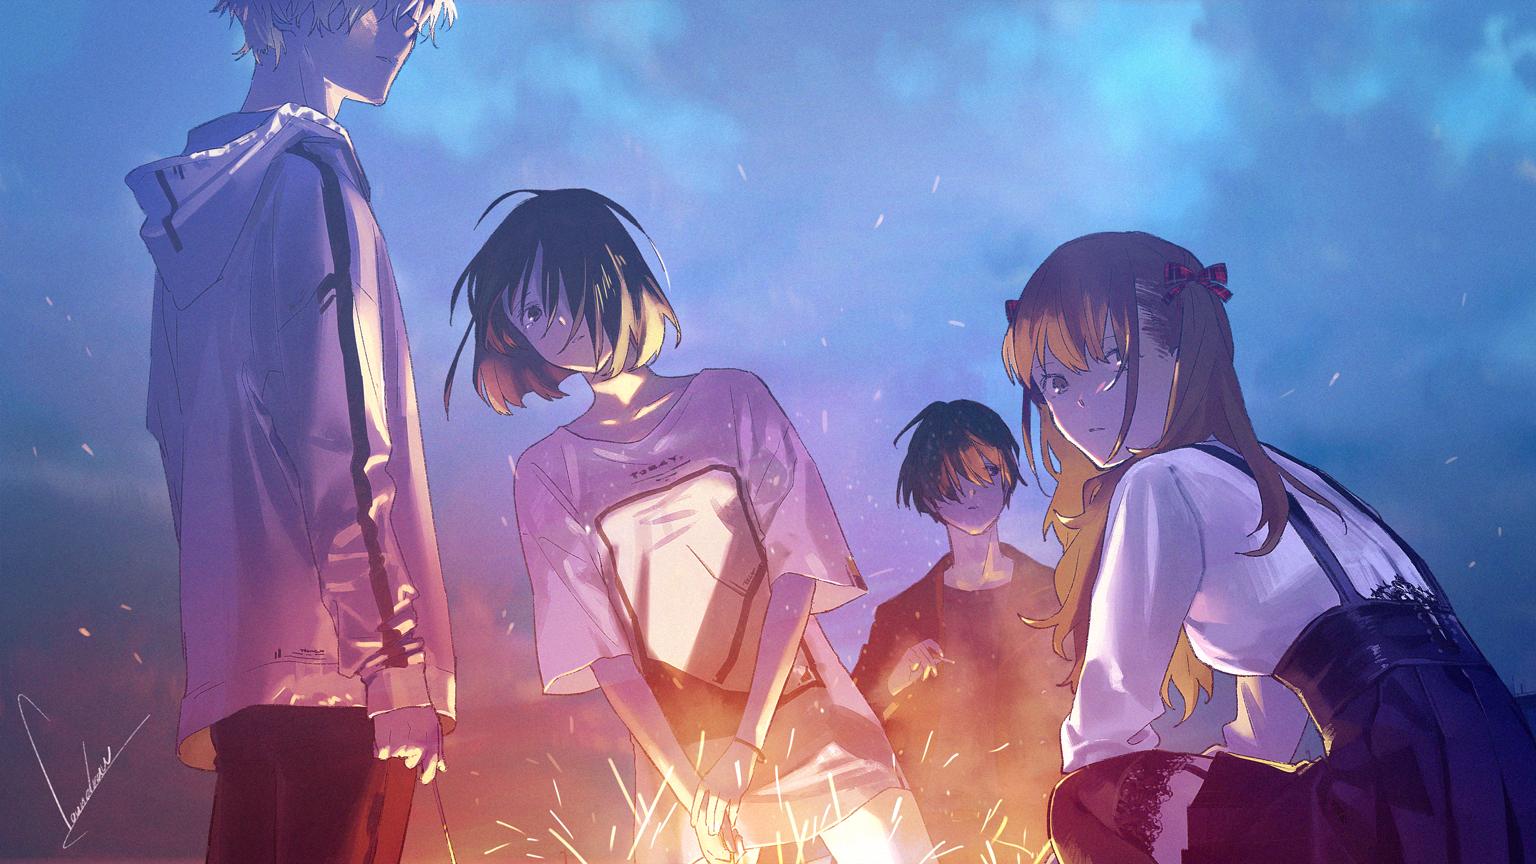 loundraw初监督作品,短篇动画电影《Summer Ghost》将于2021年上映- ACG17.COM